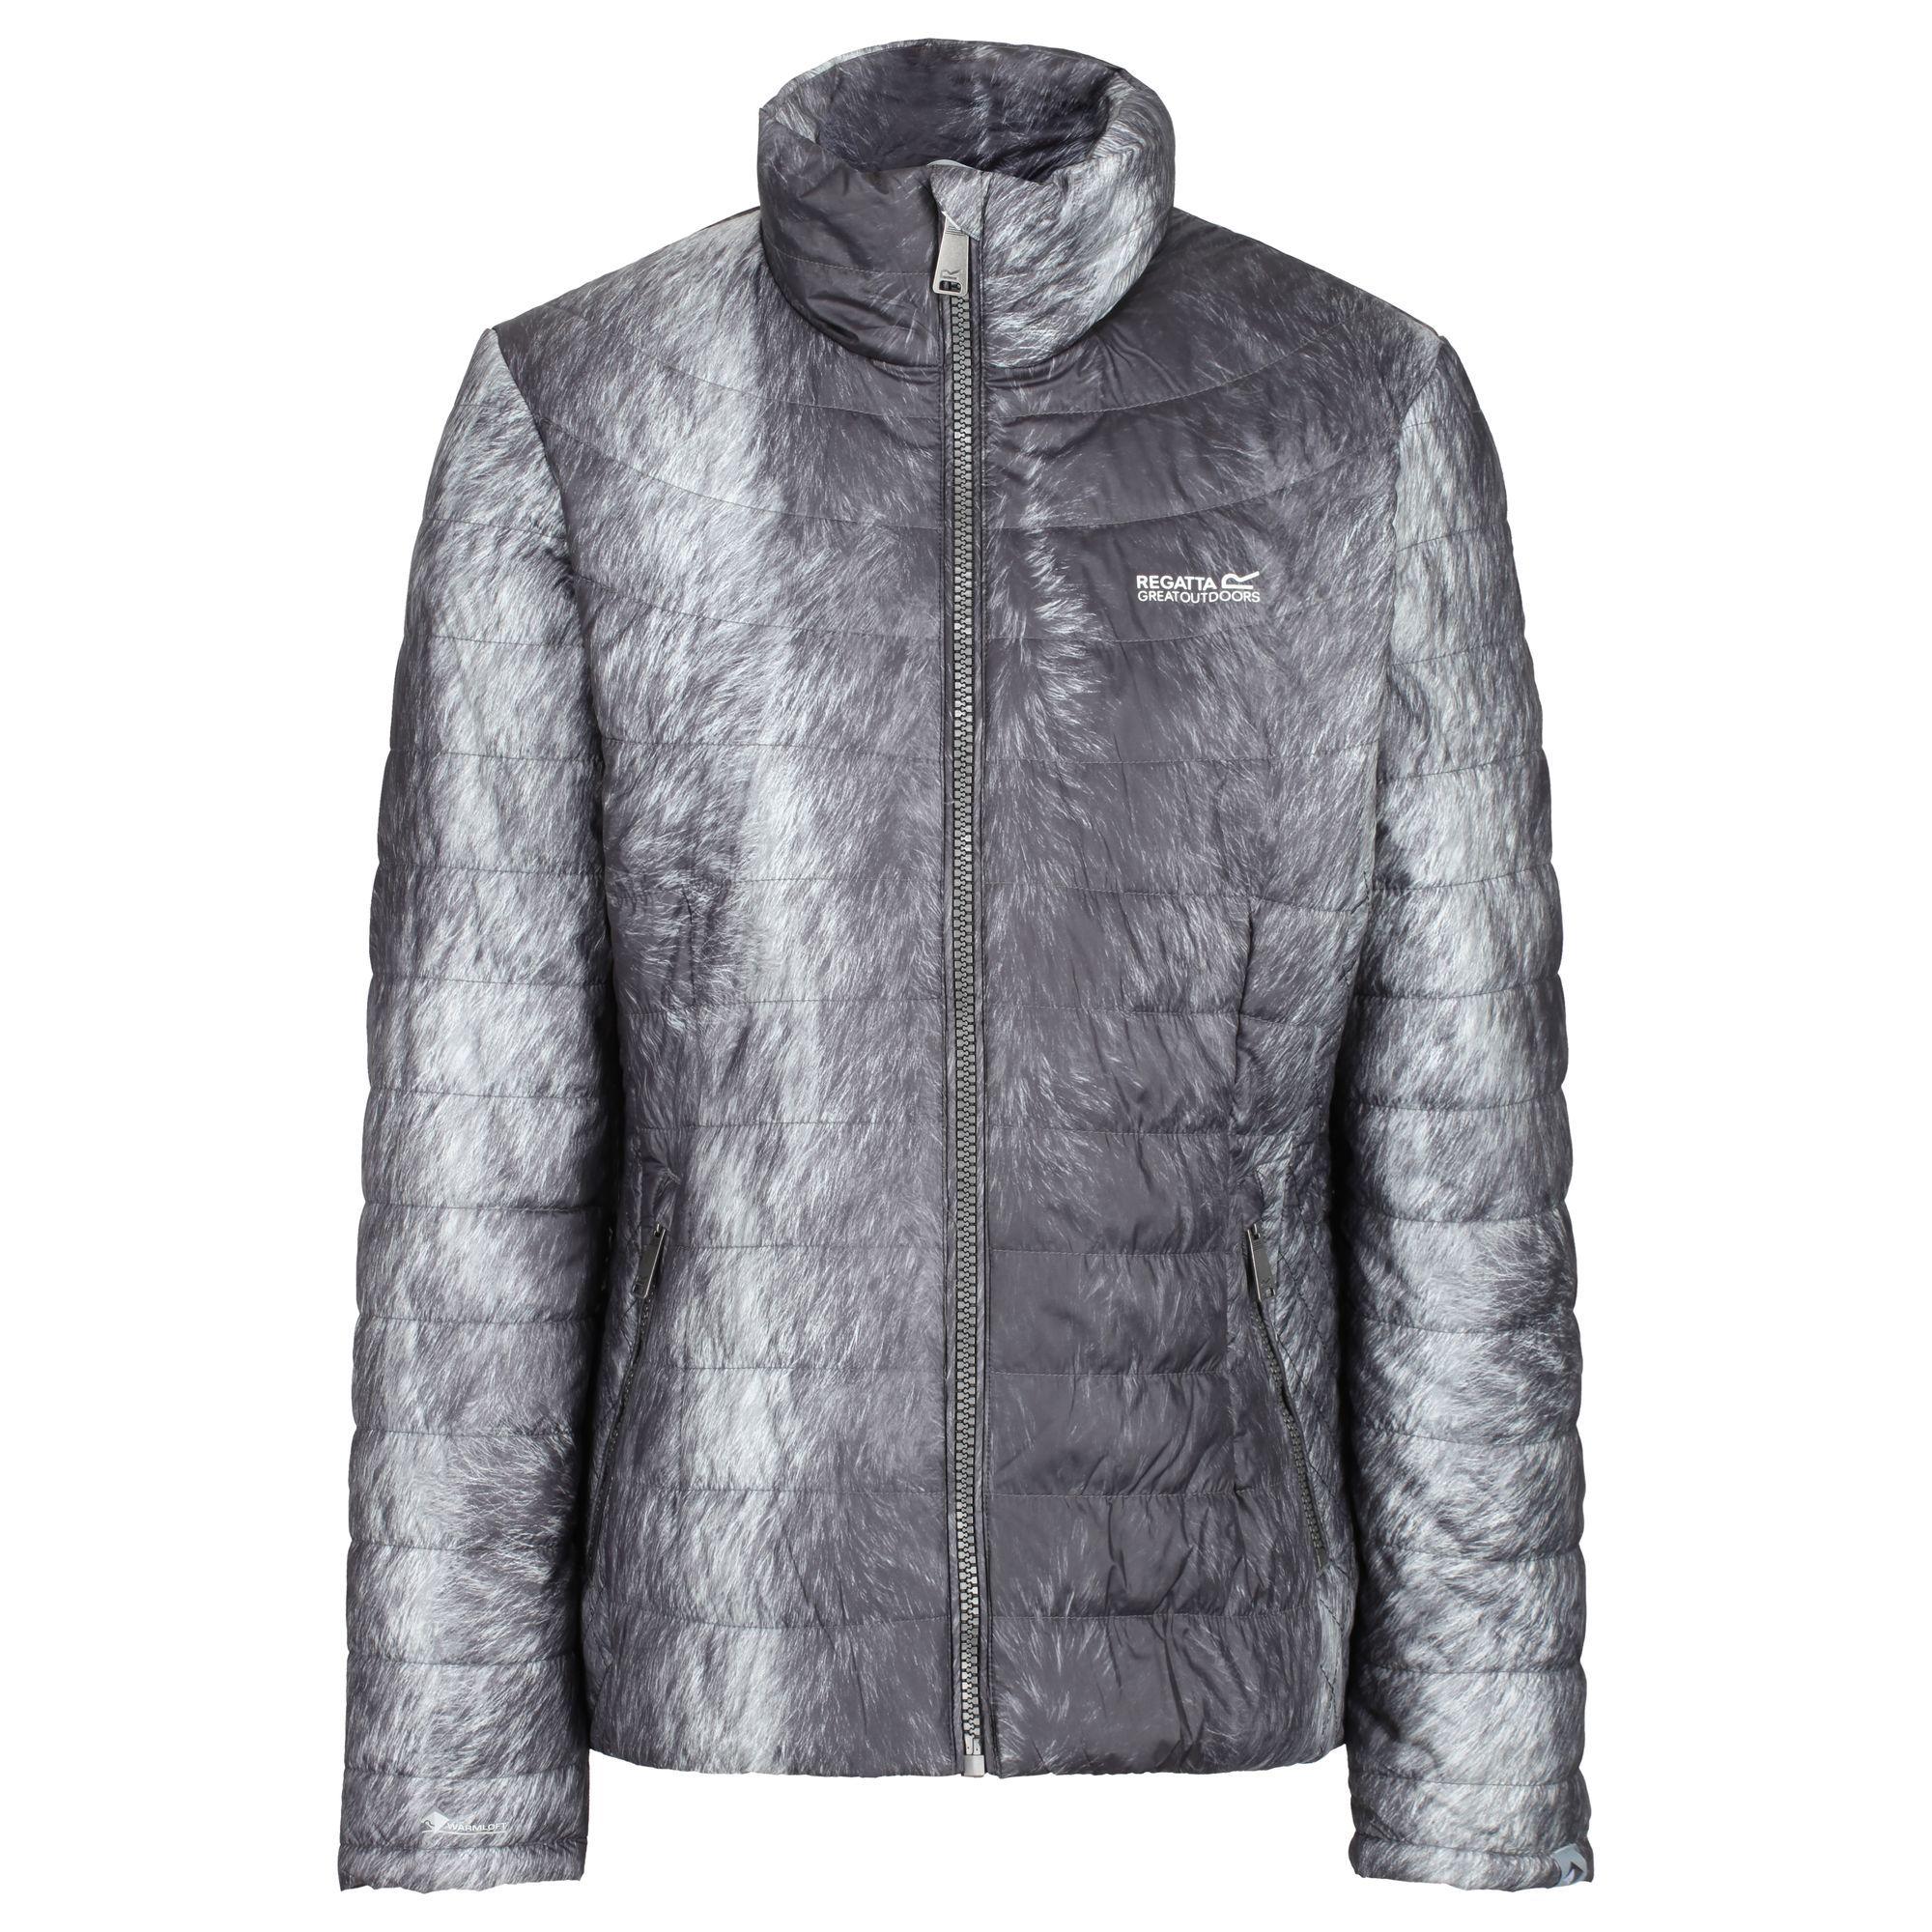 Regatta Womens/Ladies Metallia II Metallic Quilted Jacket